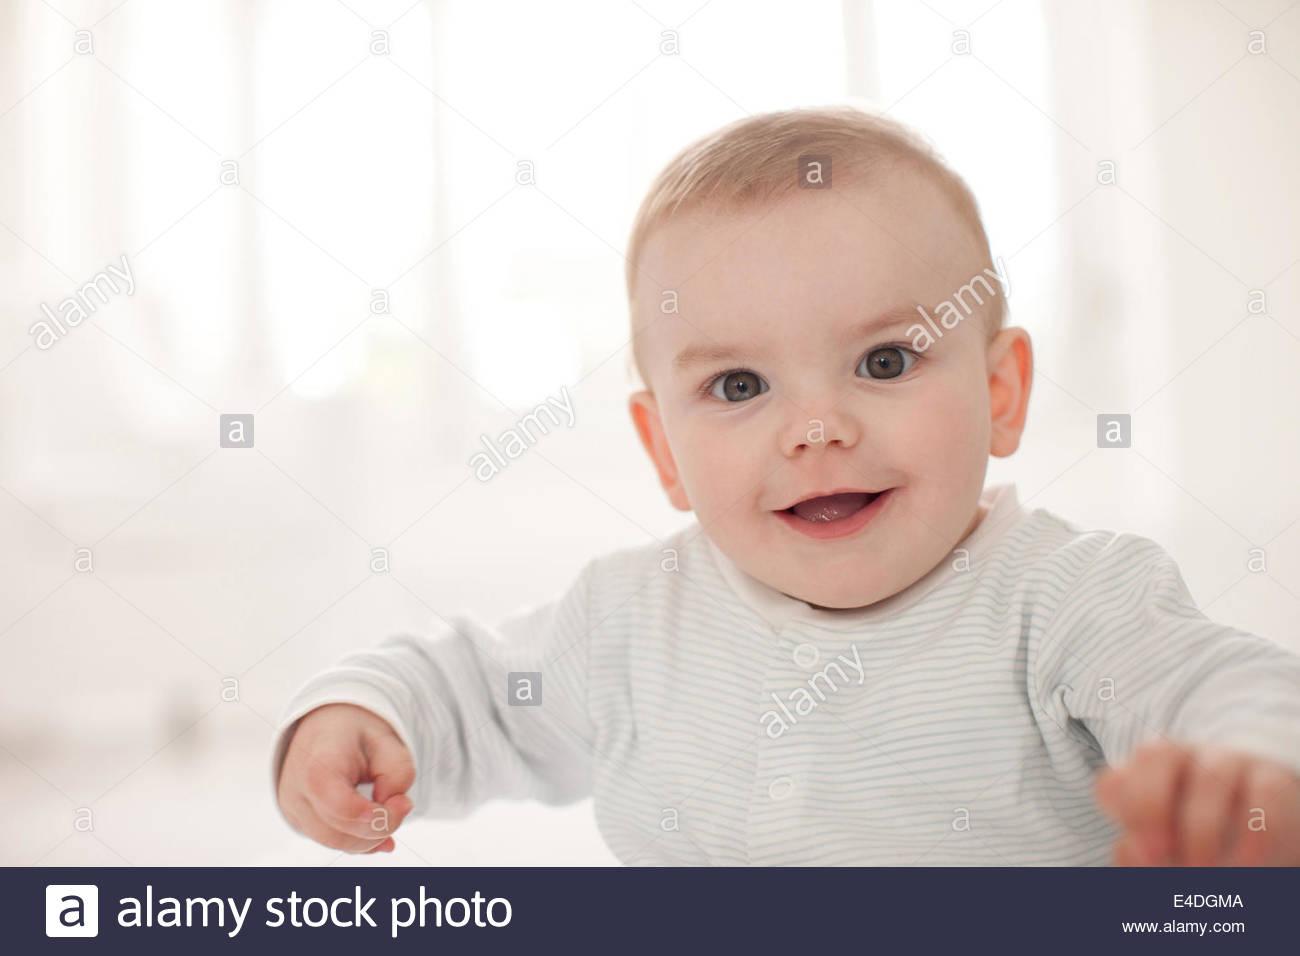 Closeup of smiling baby - Stock Image